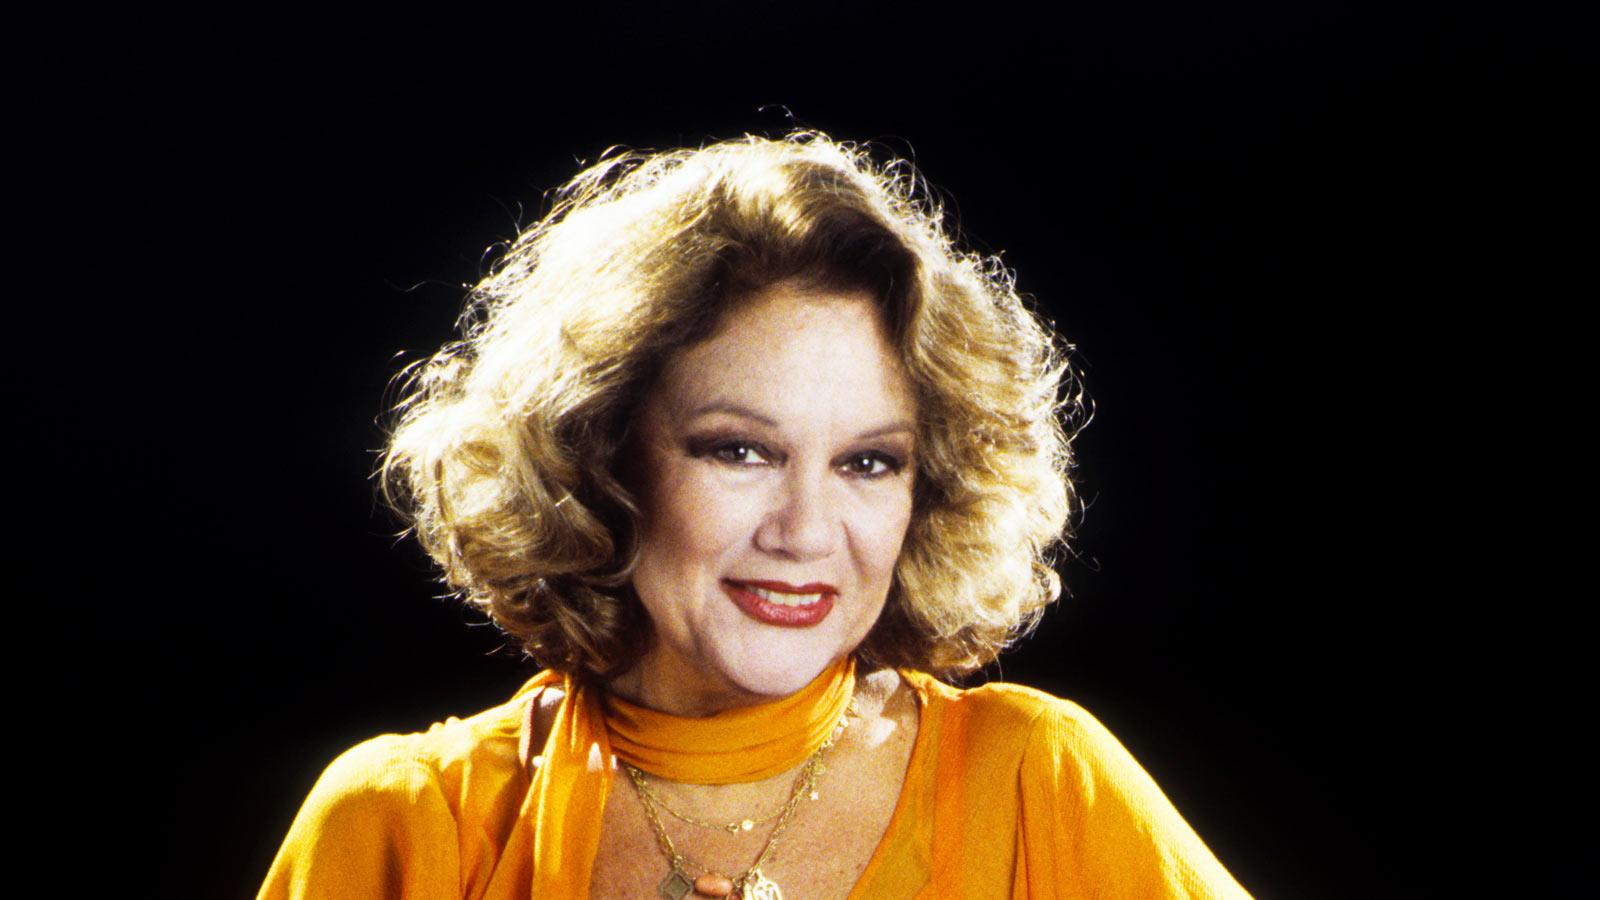 Dagmar Dahlgren,Stef Prescott (b. 1991) Erotic pics & movies Fallon (actress),Ann May